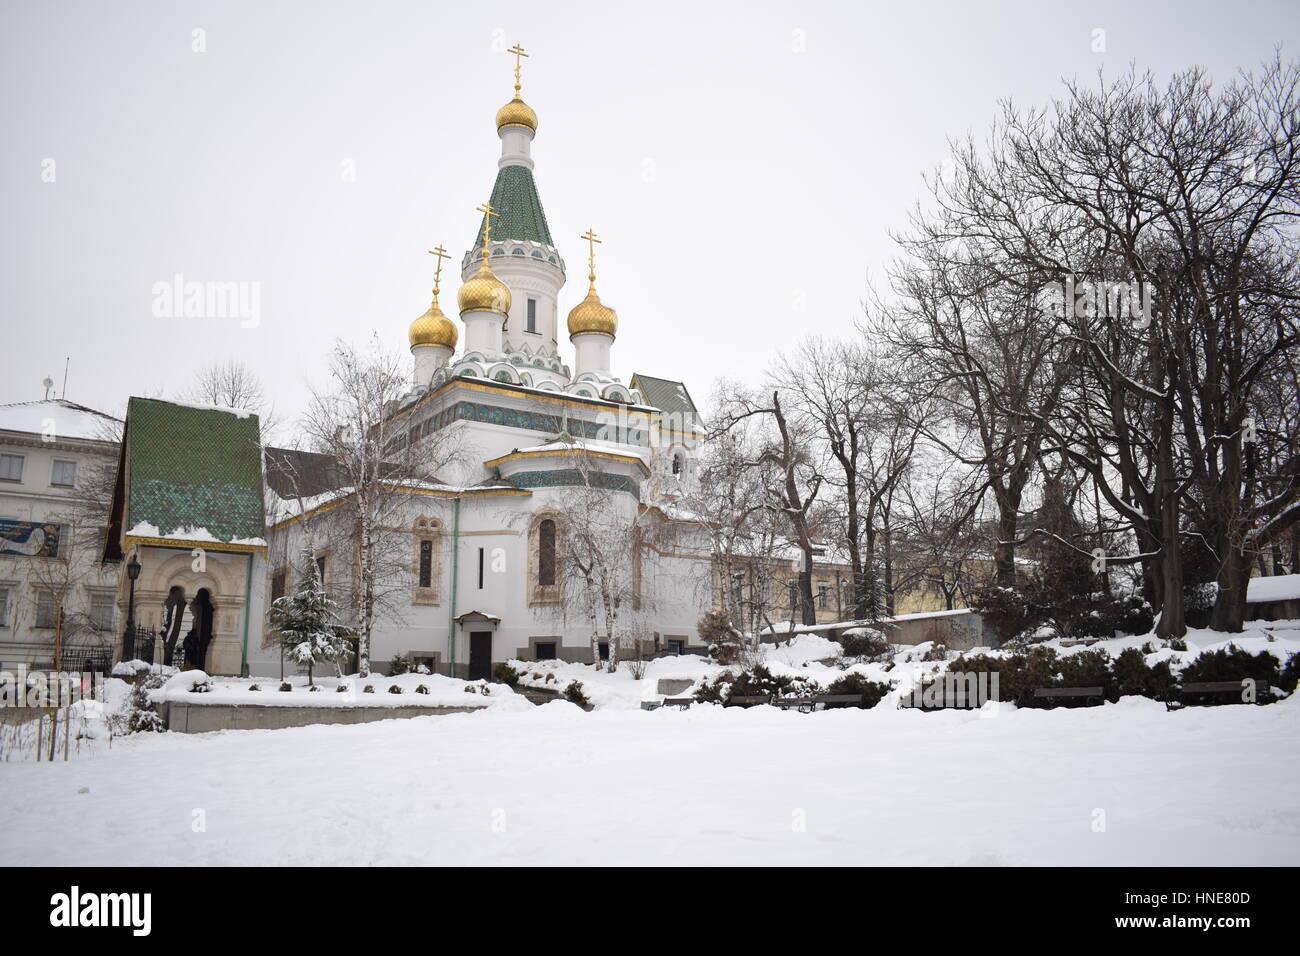 Orthodox church in snow, Sofia, Bulgaria, January 2017 - Stock Image